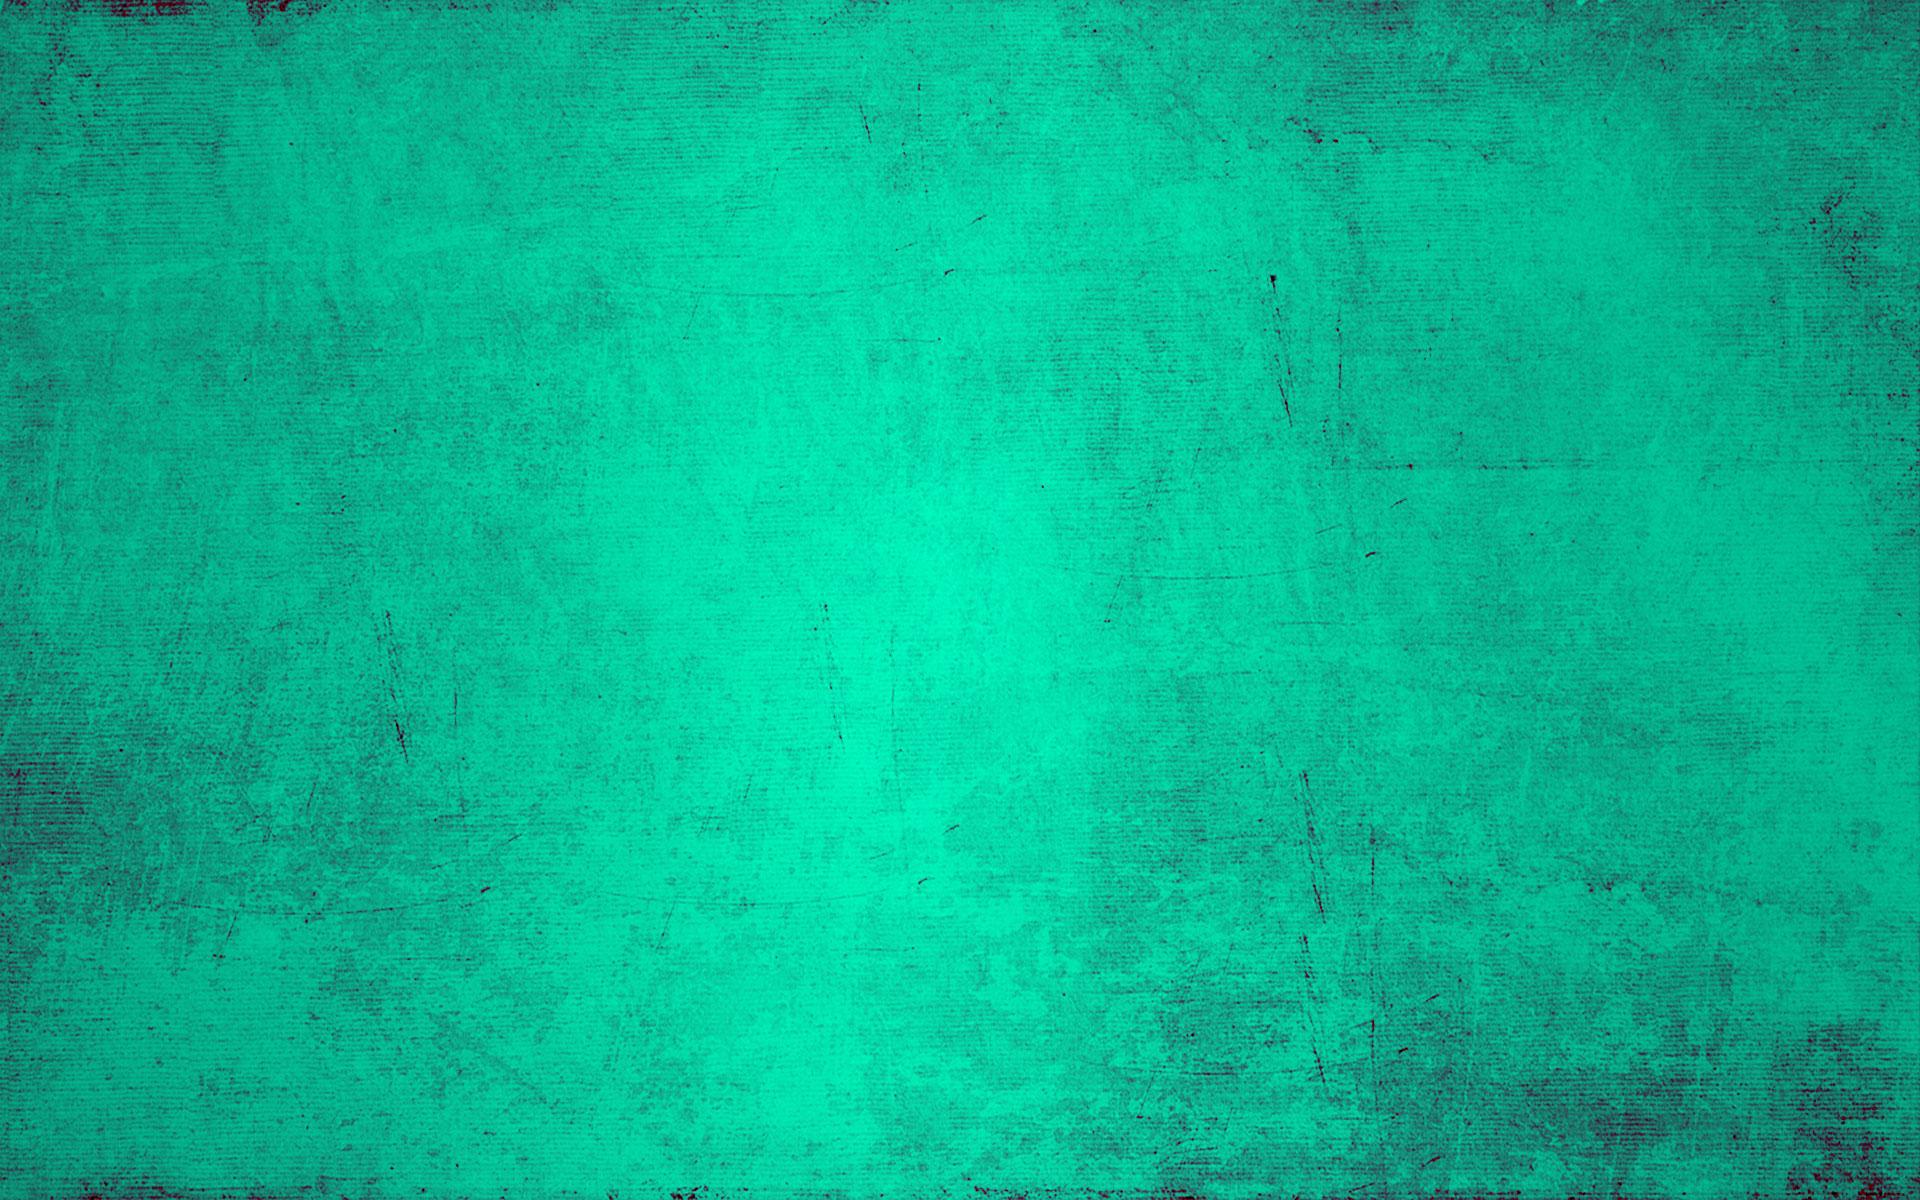 Cool-1920x1080-wallpaper-wp3604346